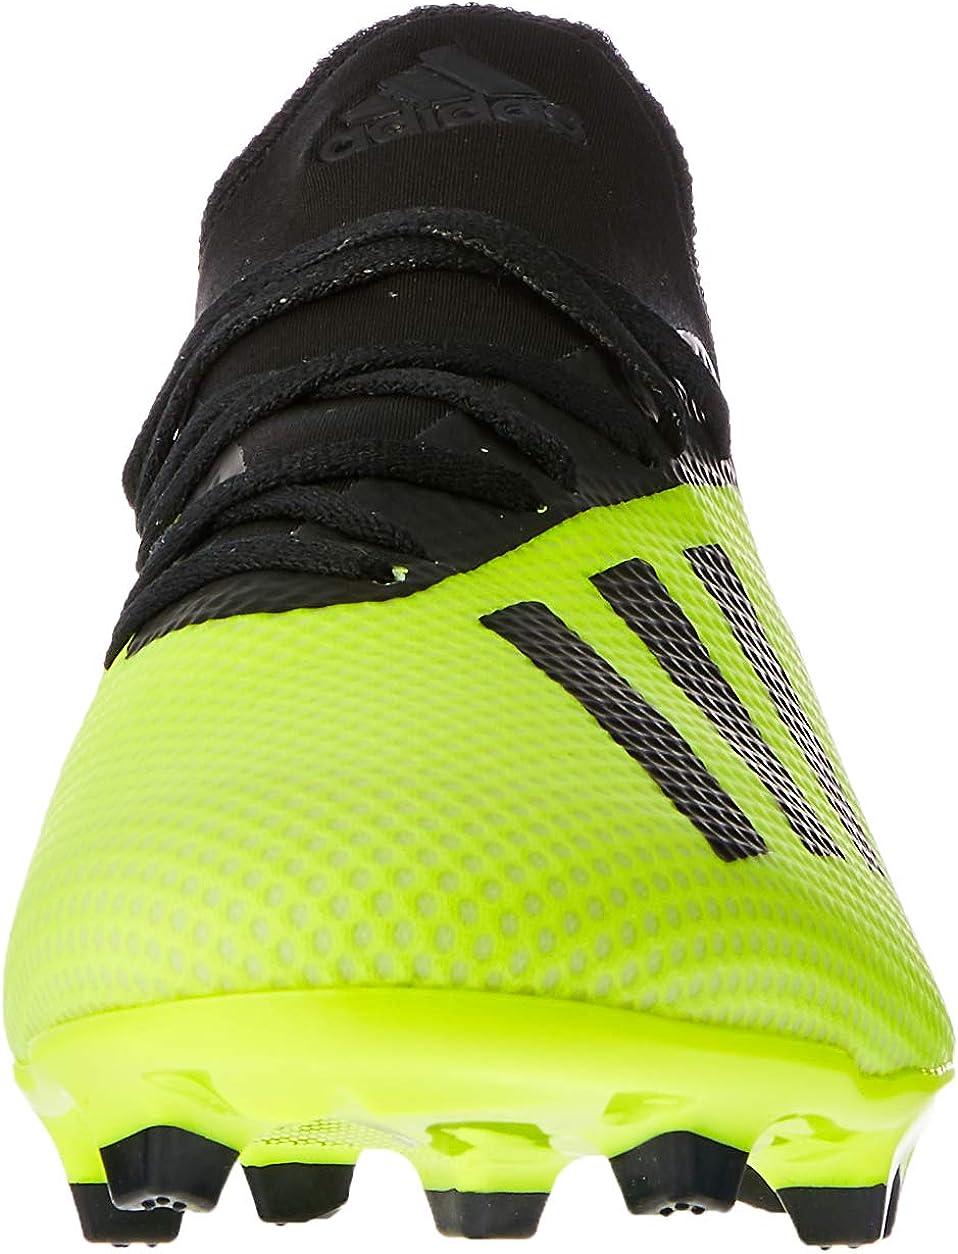 adidas X 18.3 FG, Chaussures de Football Homme Jaune Amasol Negbás Ftwbla 001